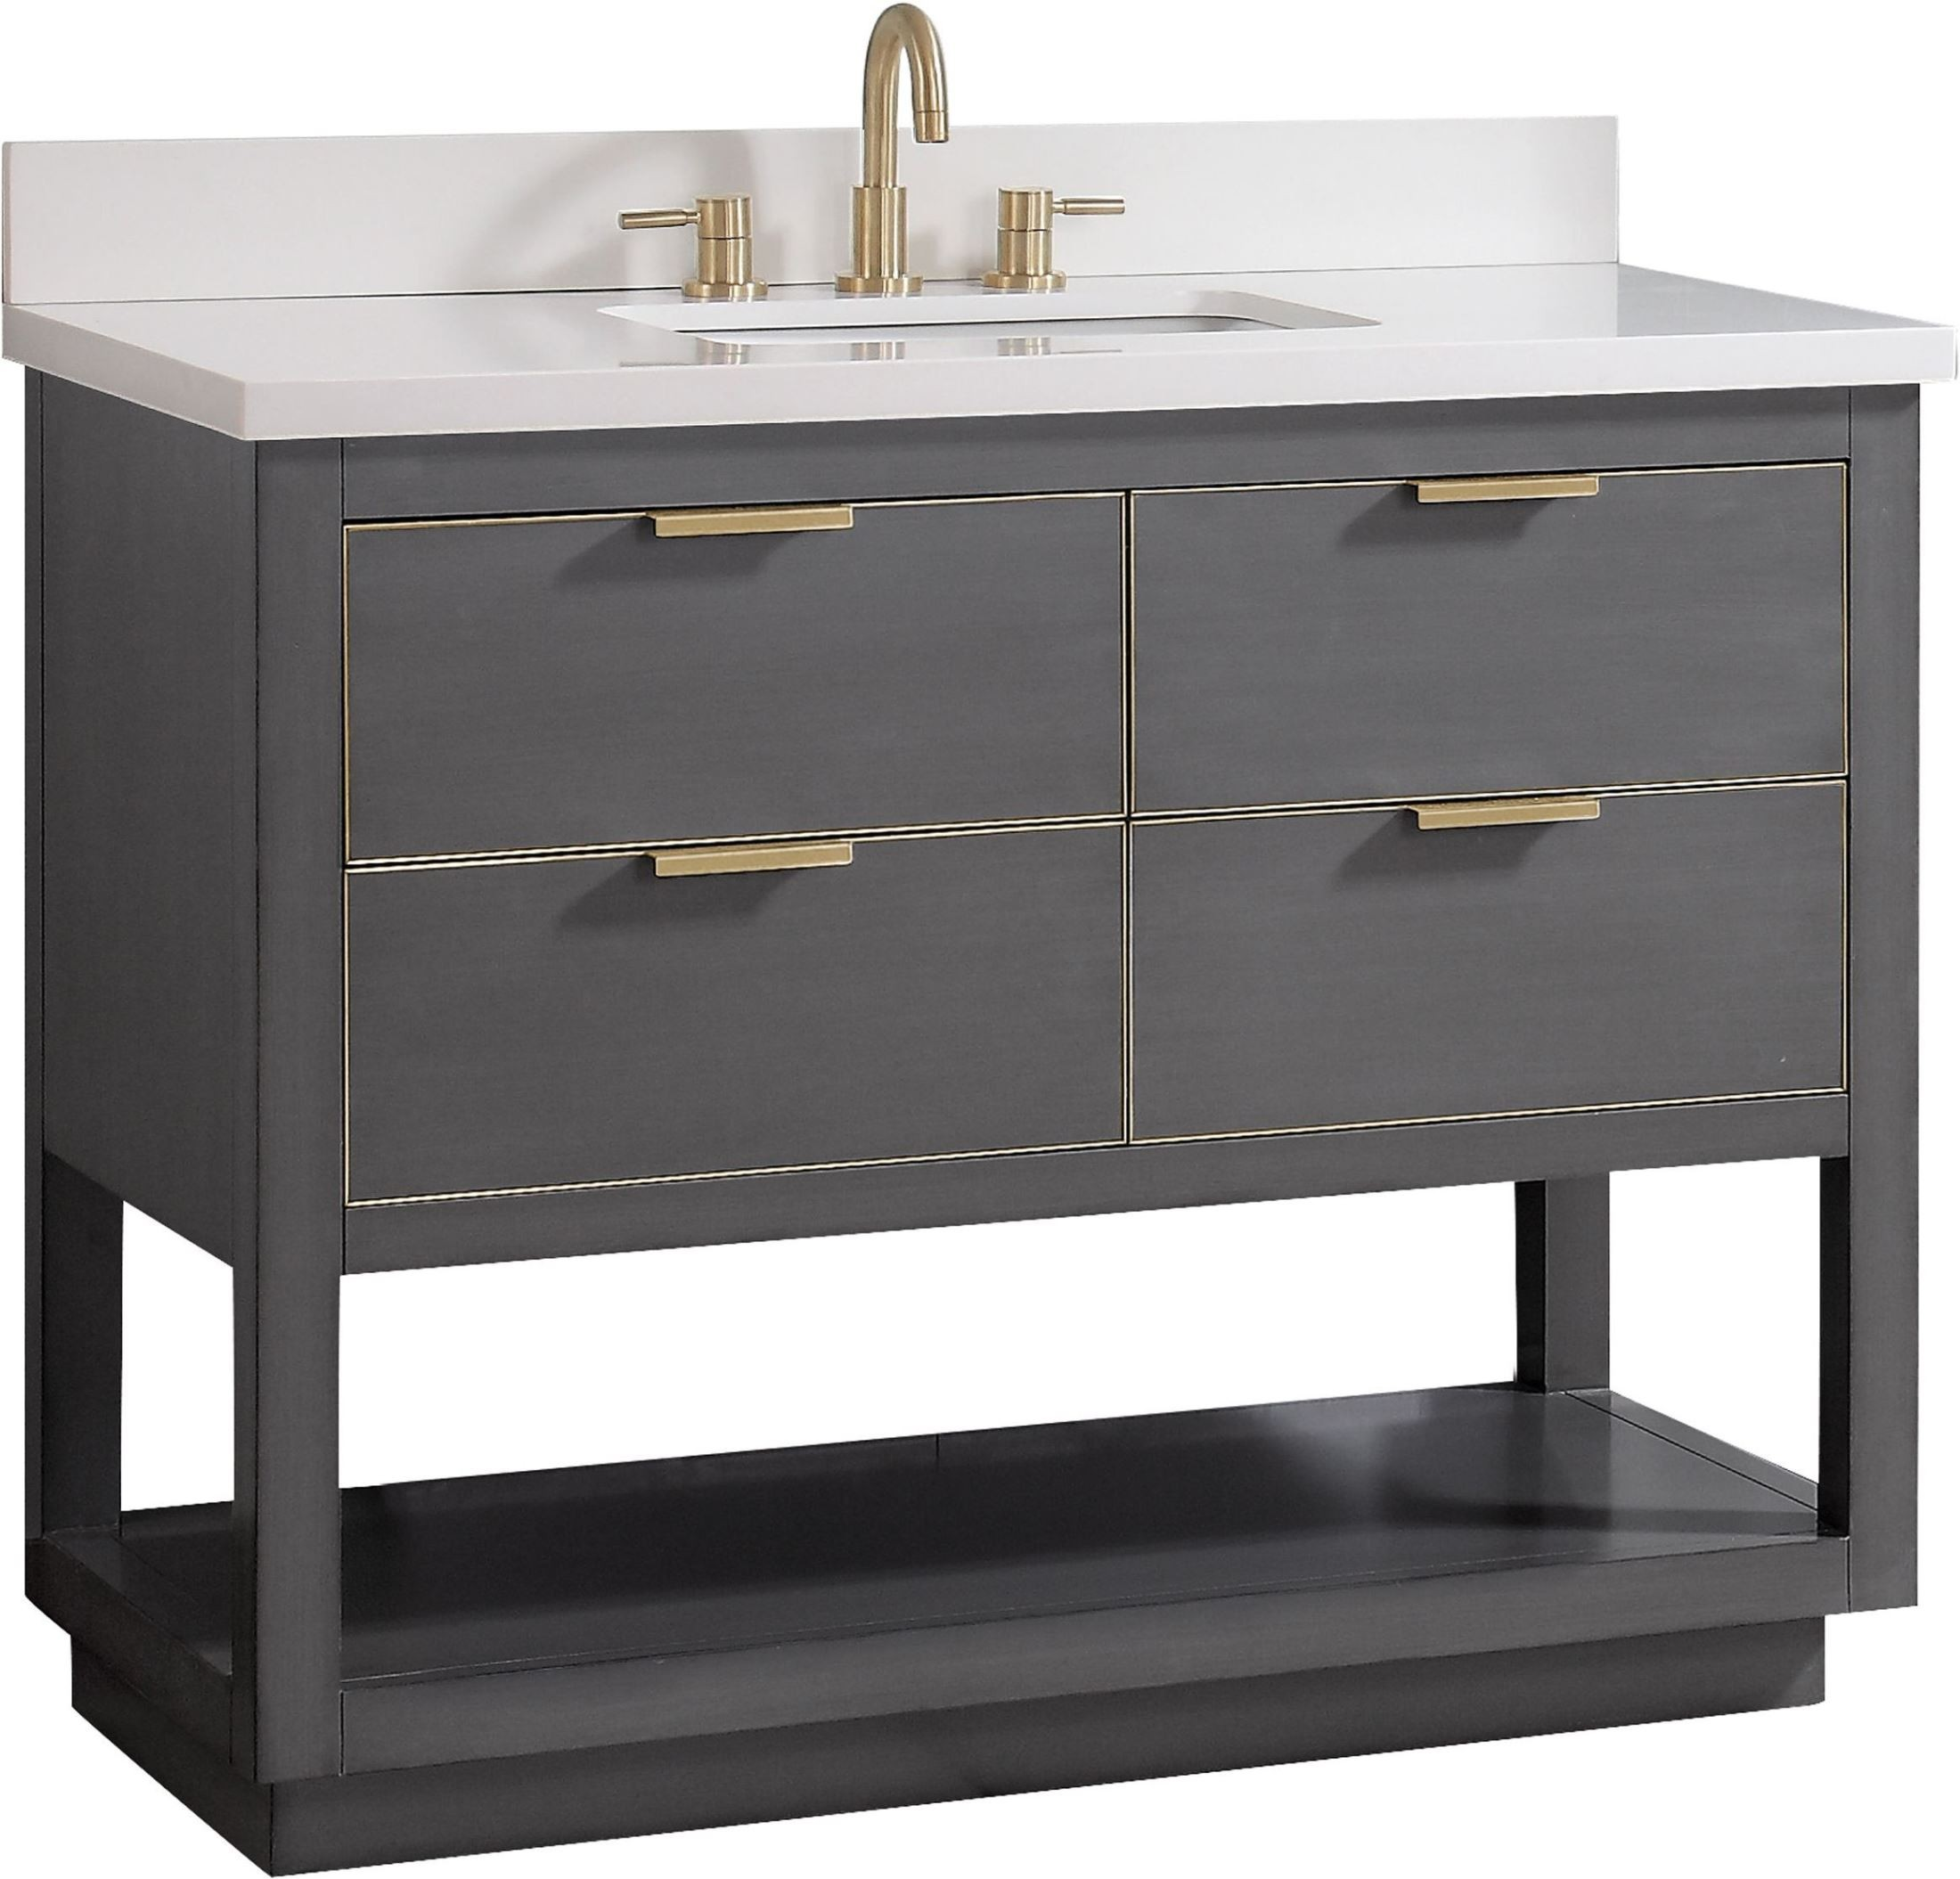 Allie Twilight Gray And Gold Trim 43 Vanity With White Quartz Top